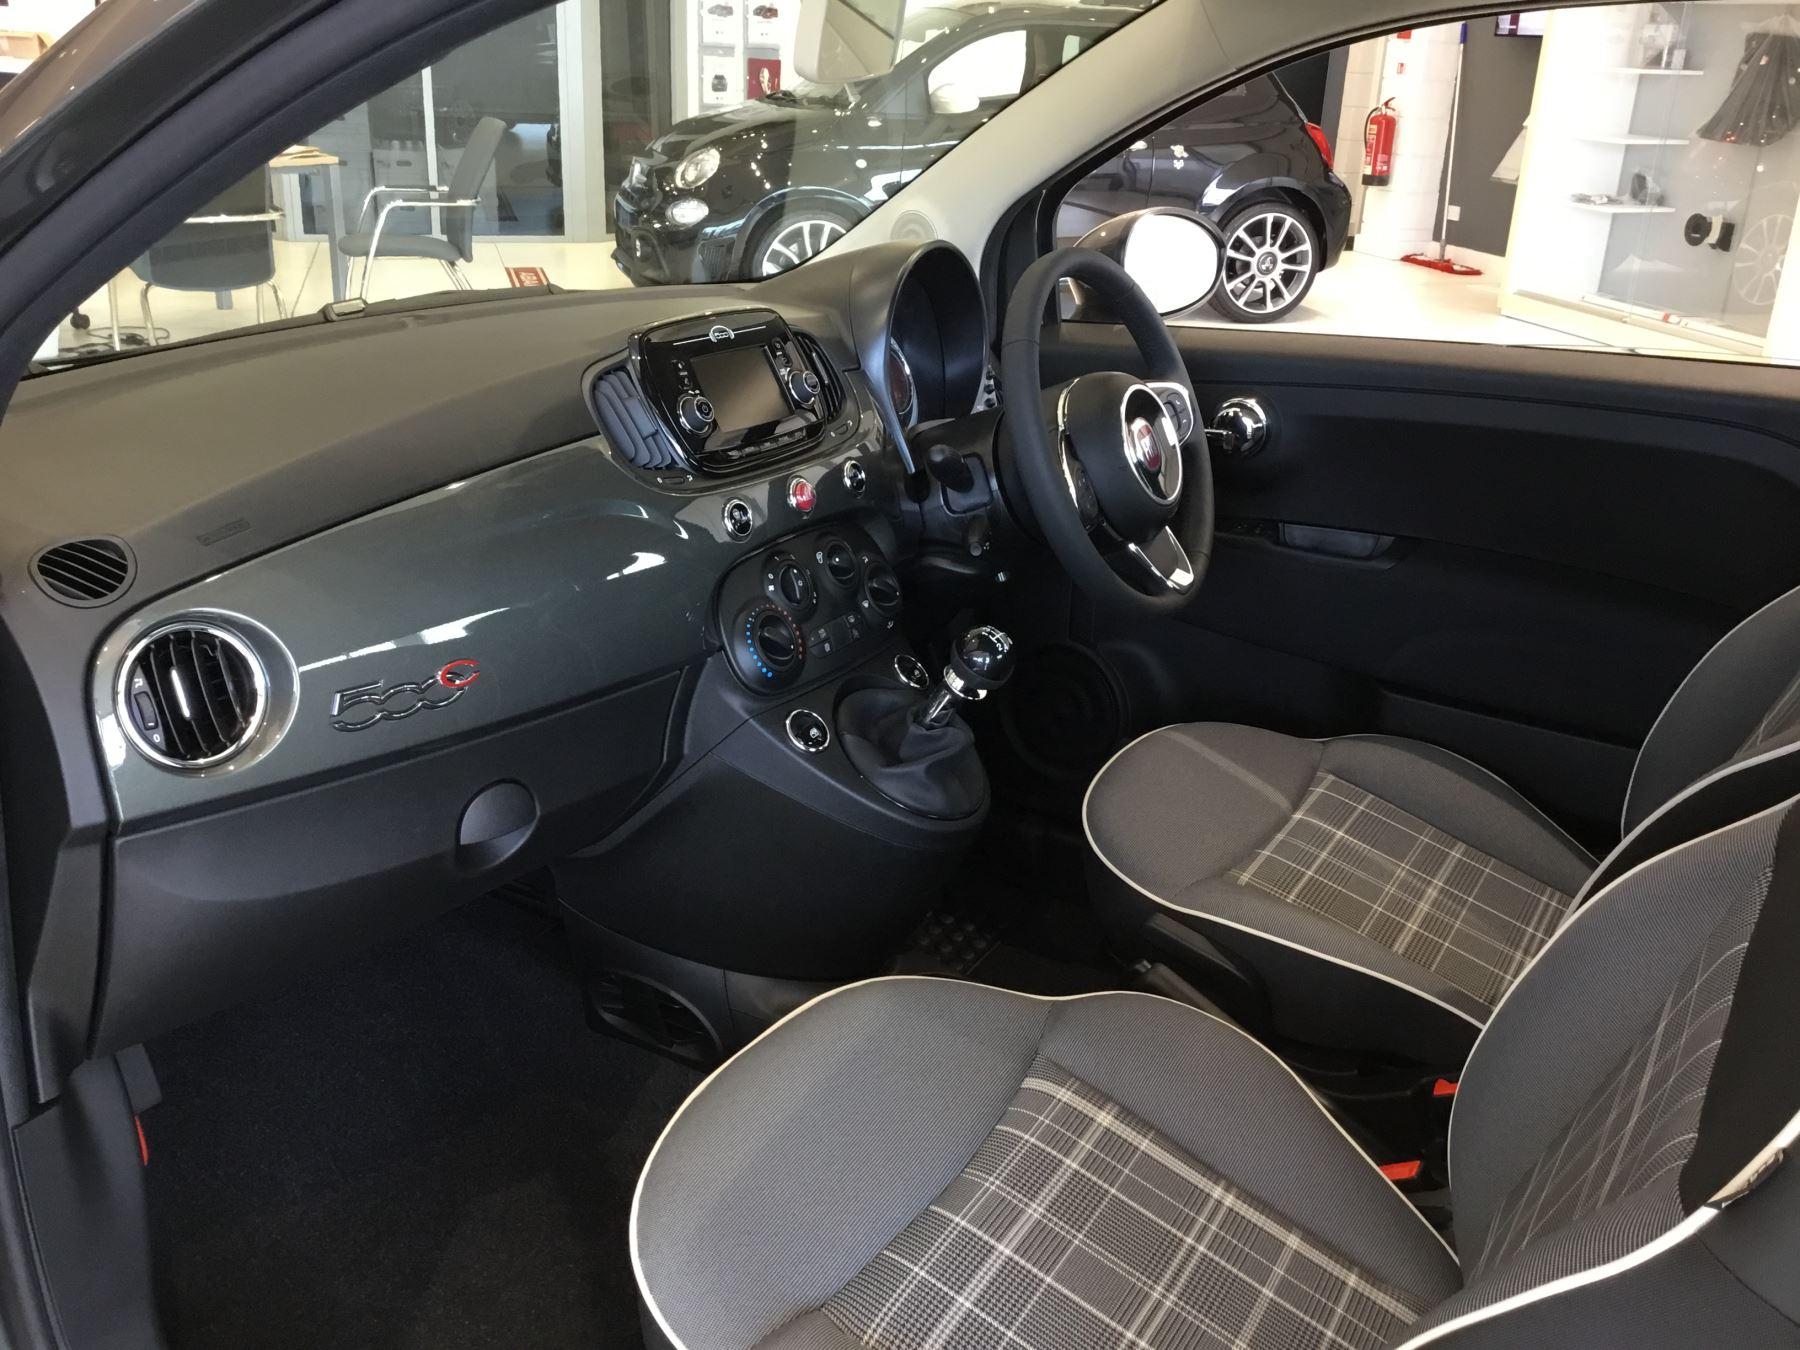 Fiat 500 1.2 Lounge 2dr image 18